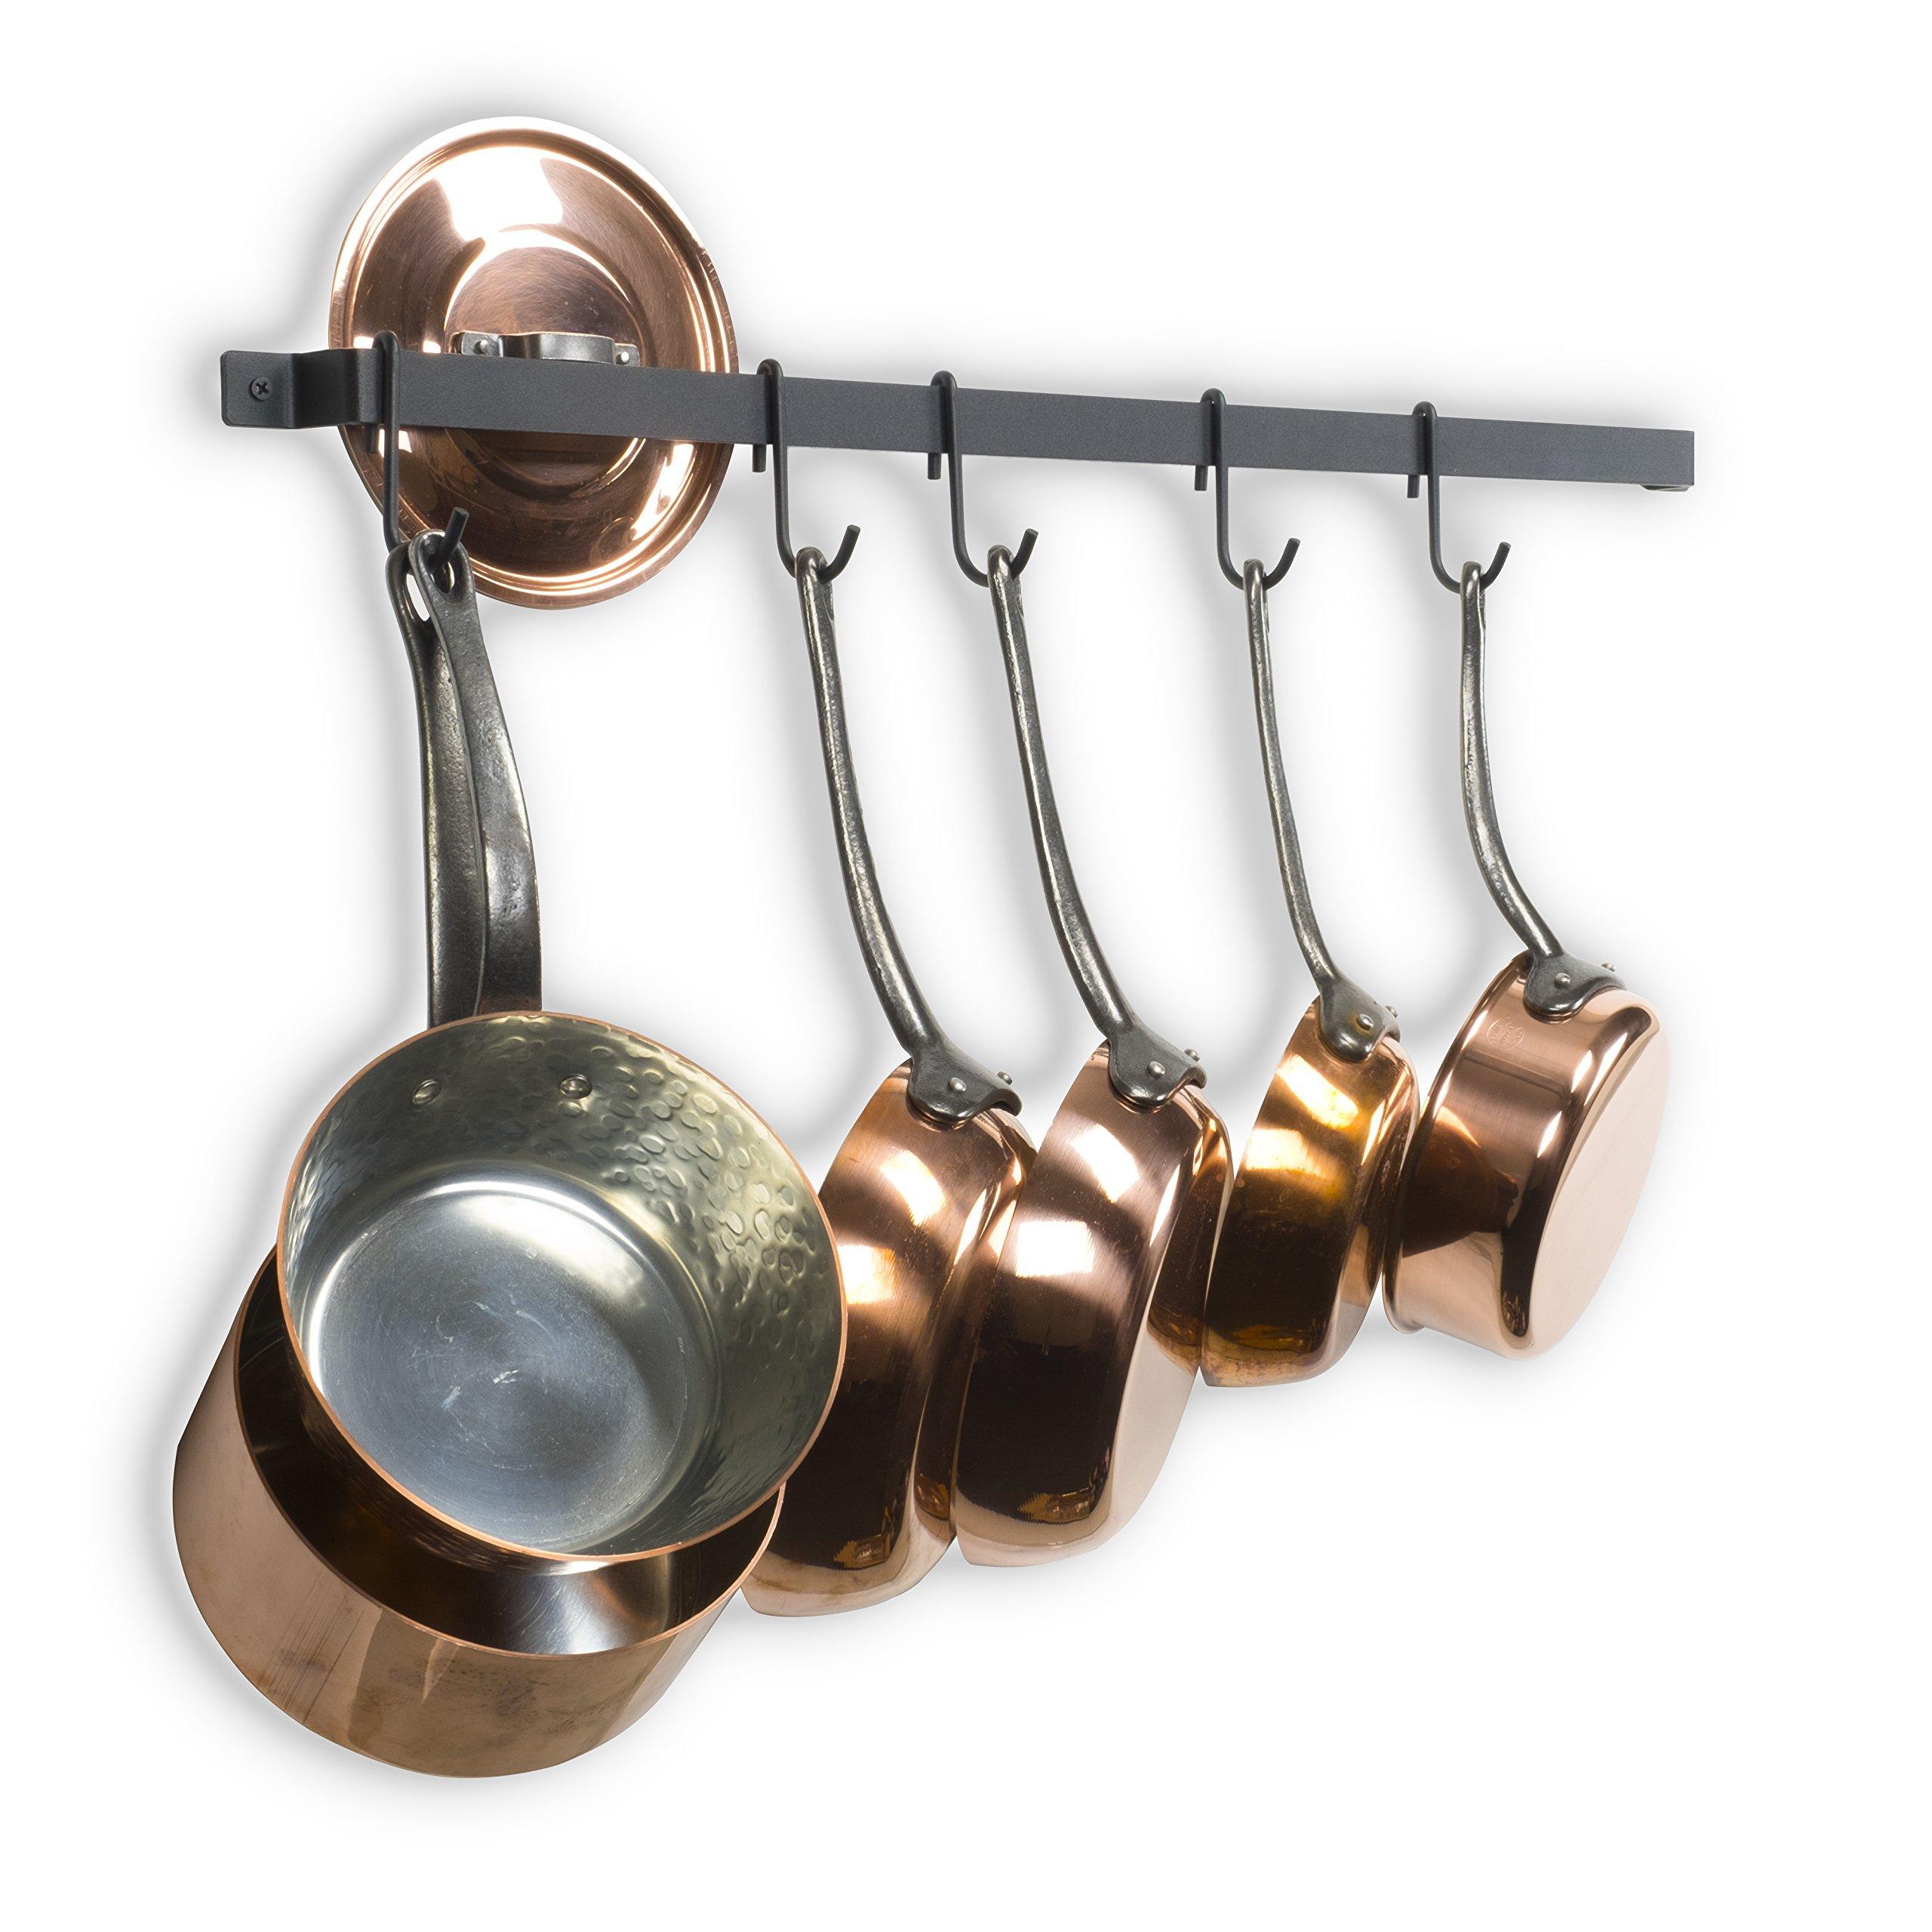 Kitchen Design Hanging Pots And Pans: Cookware Wall Mount Hanging Pot Pan Rack Kitchen Organizer